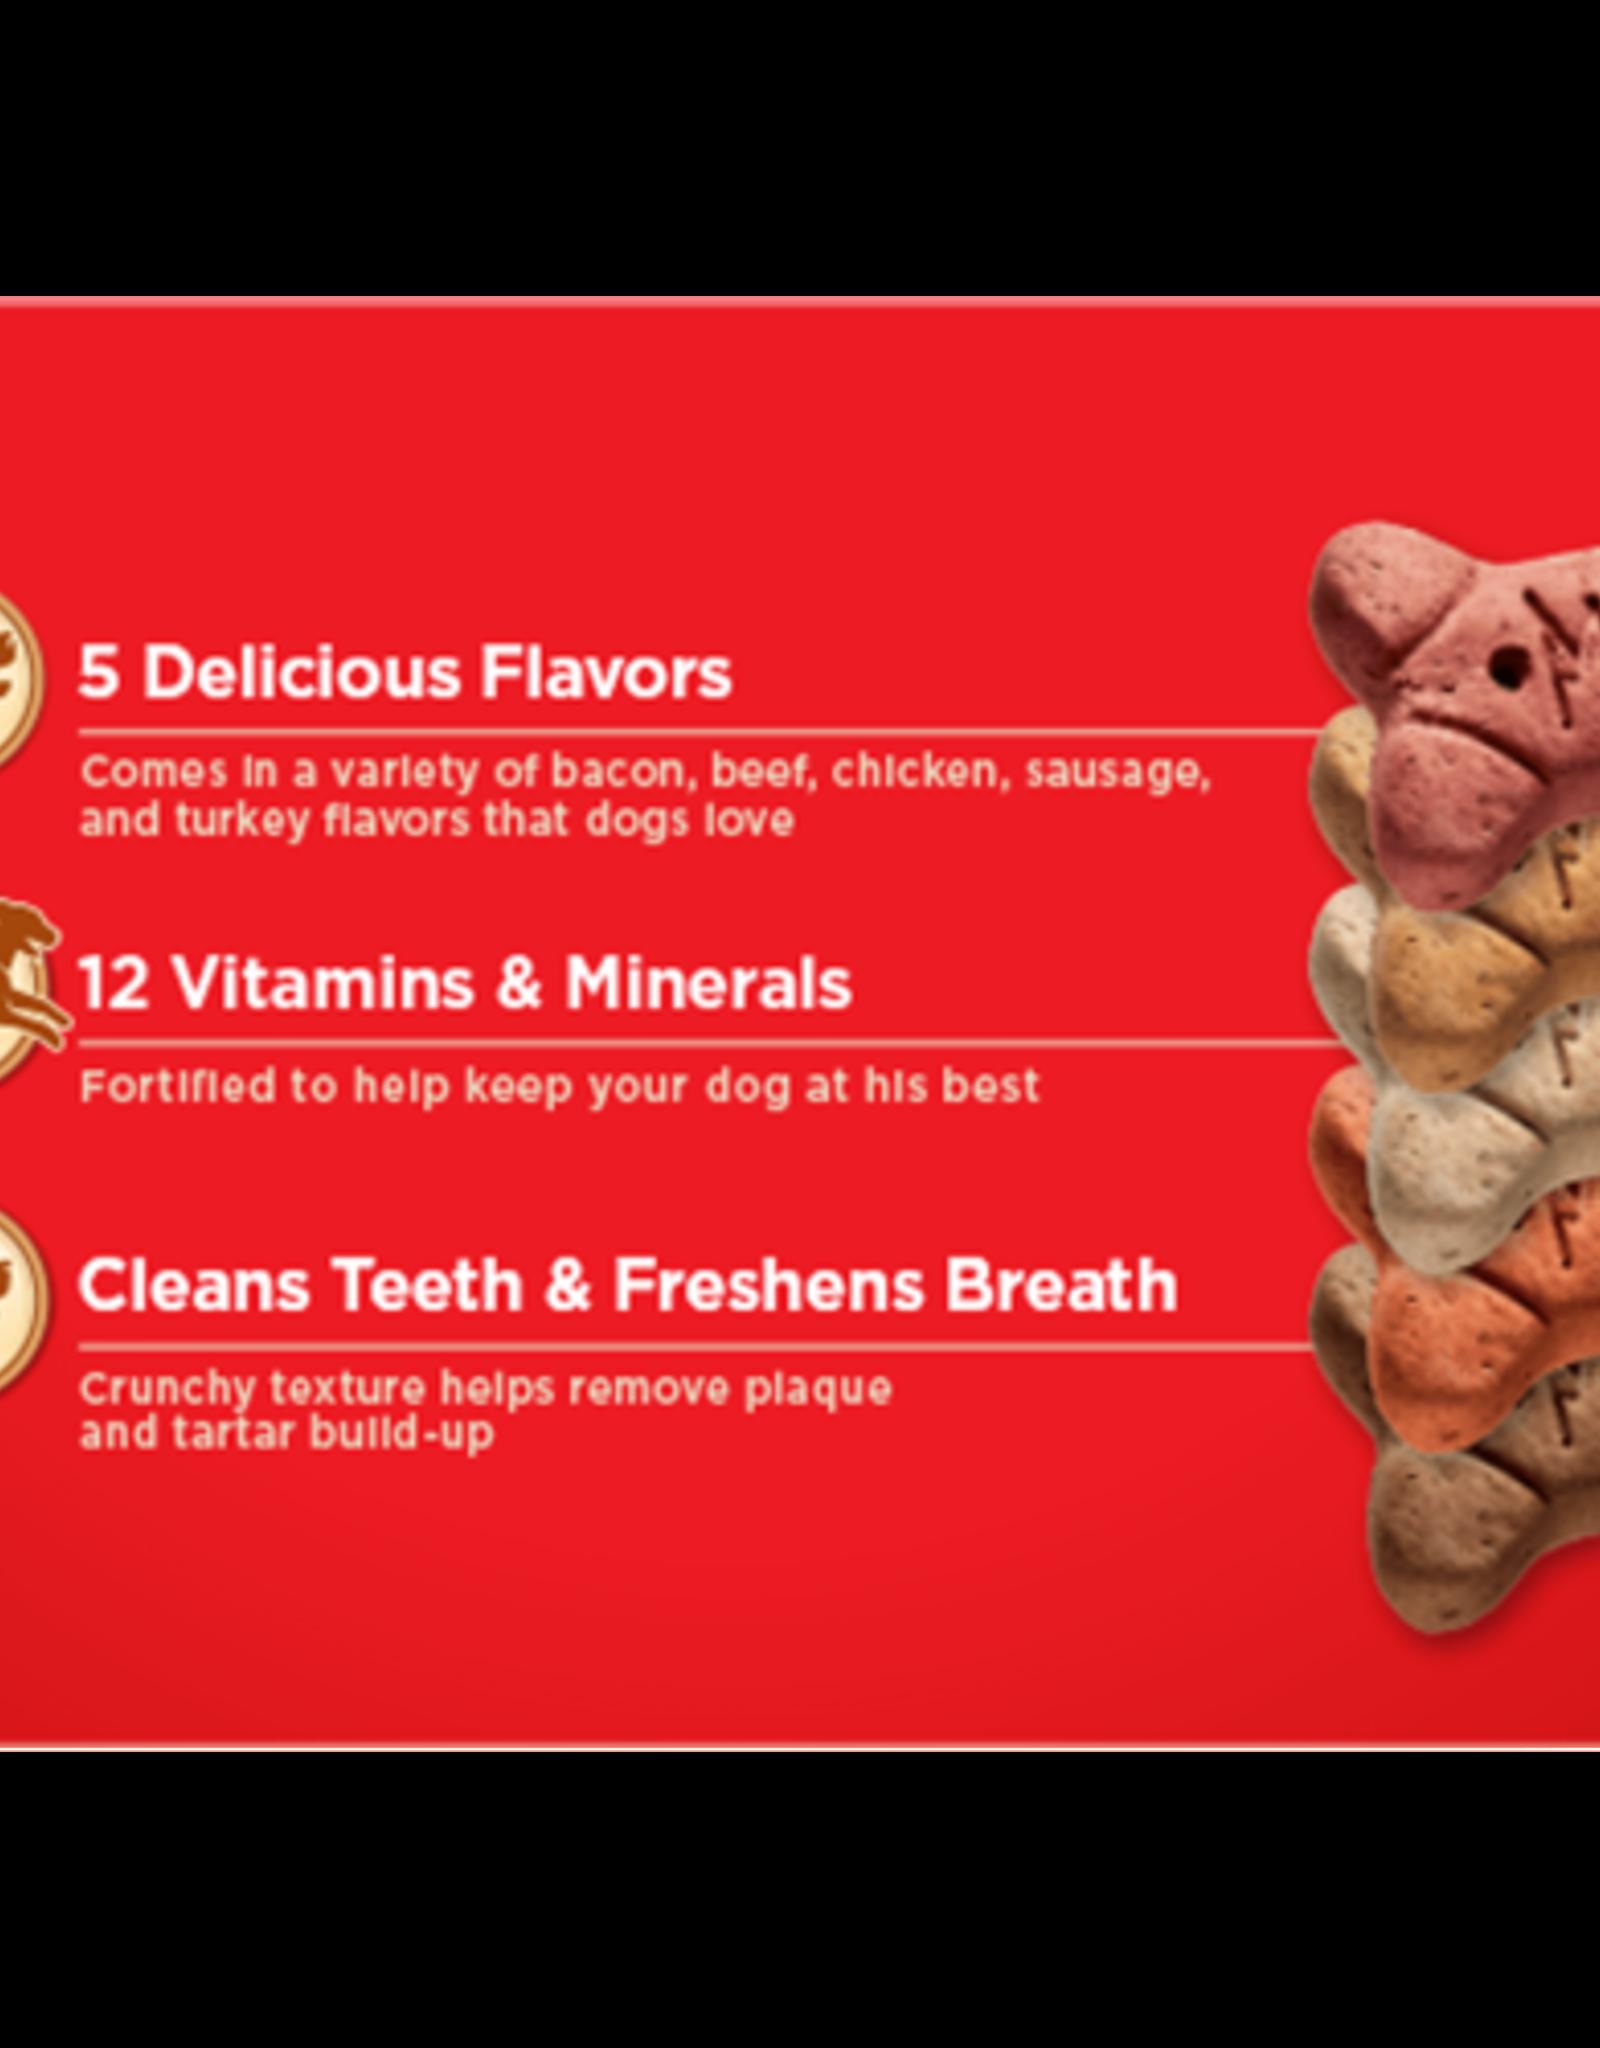 DELMONTE FOODS LLC MILKBONE BISCUITS FLAVOR SNACKS 24OZ